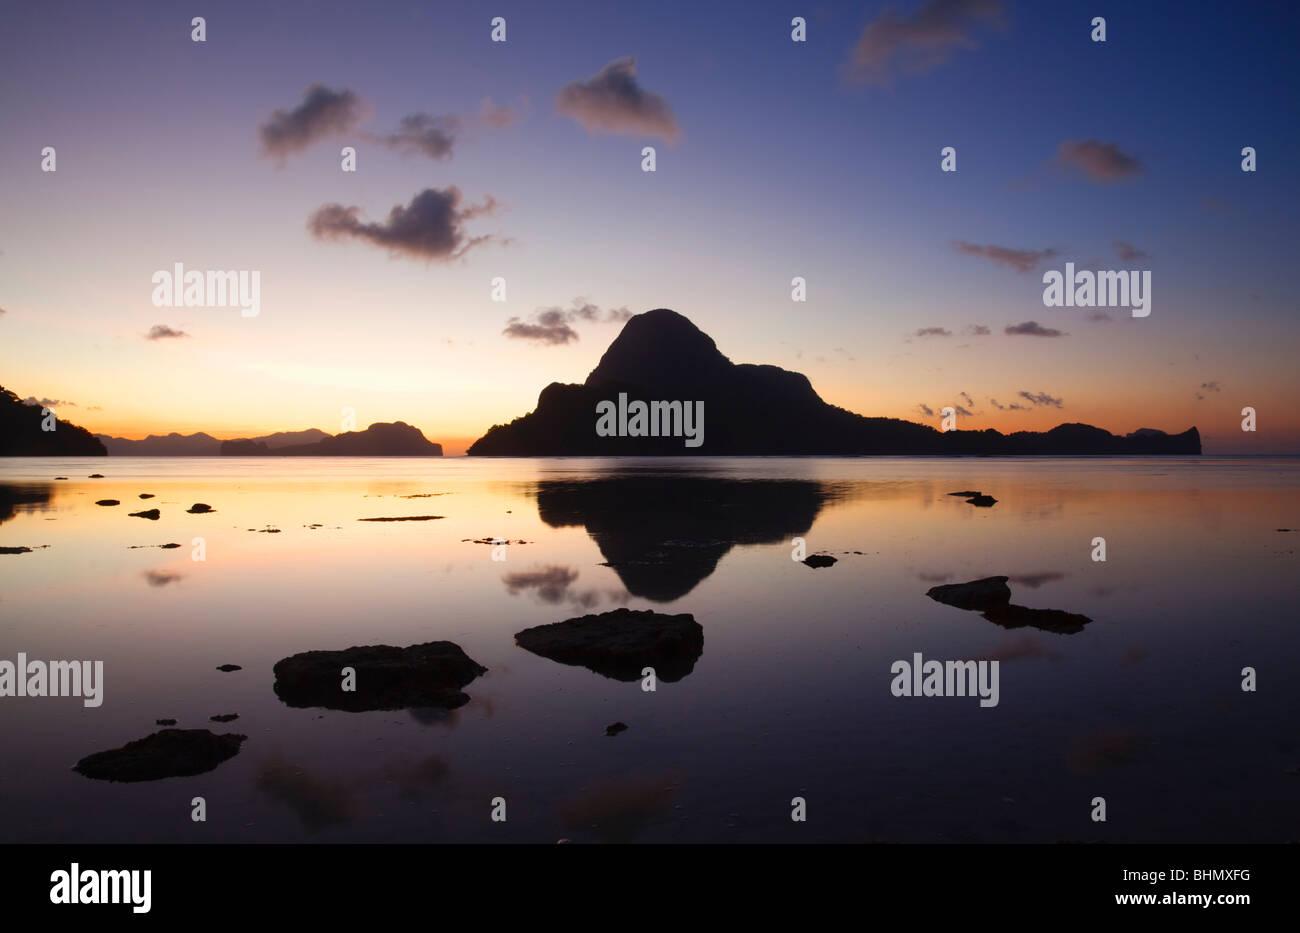 Sunset over Cadlao Island; El Nido; Bacuit Bay; Palawan; Philippines. - Stock Image